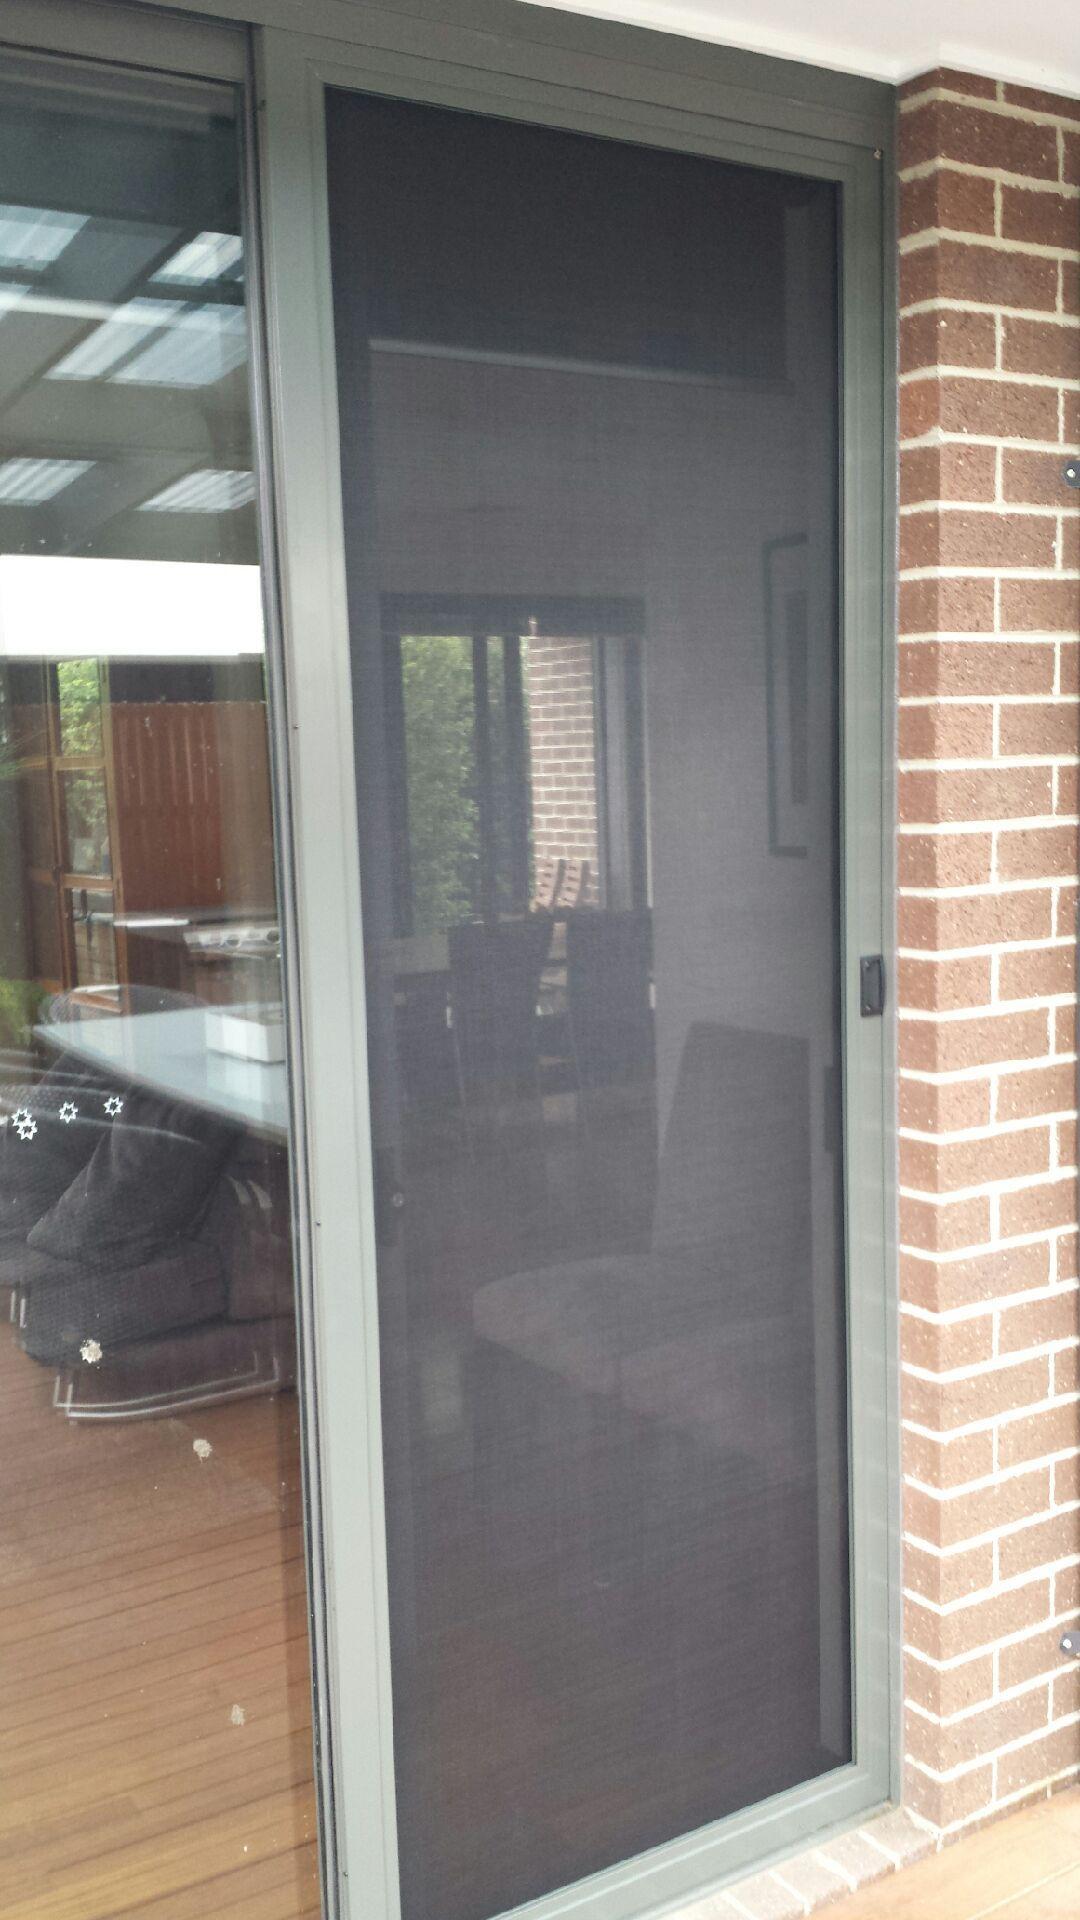 Aluminum frame screen sliding door with pet mesh , installed